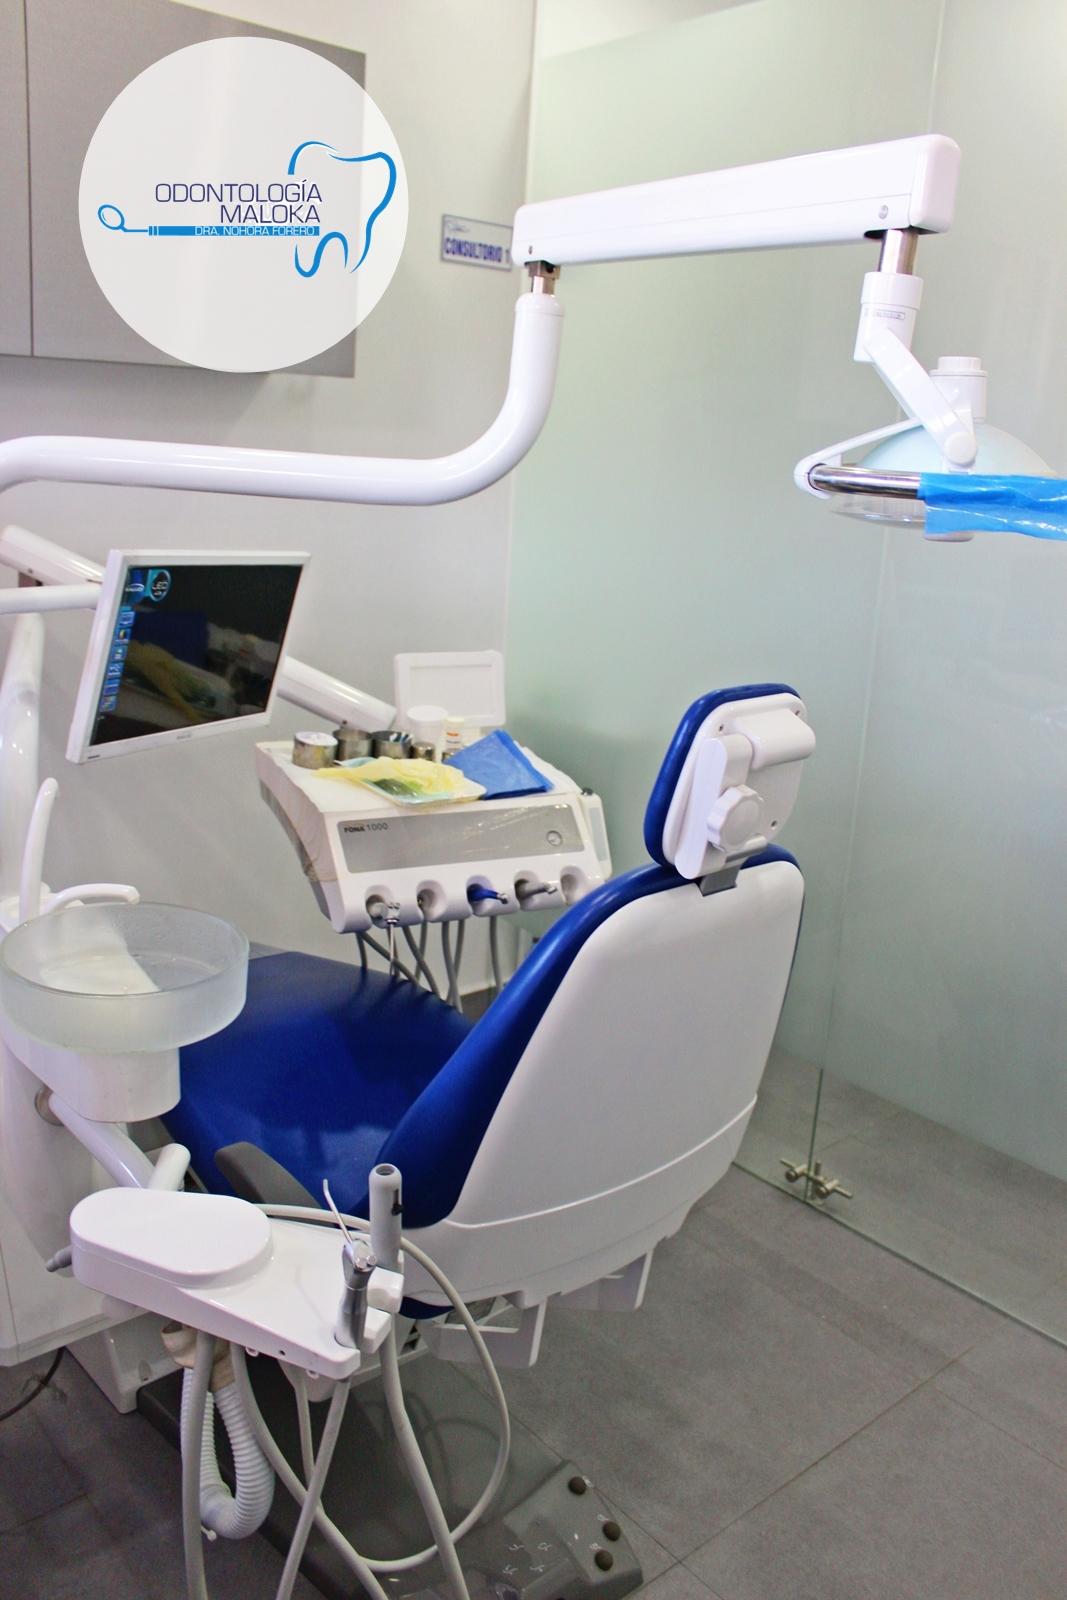 odontologia maloka3